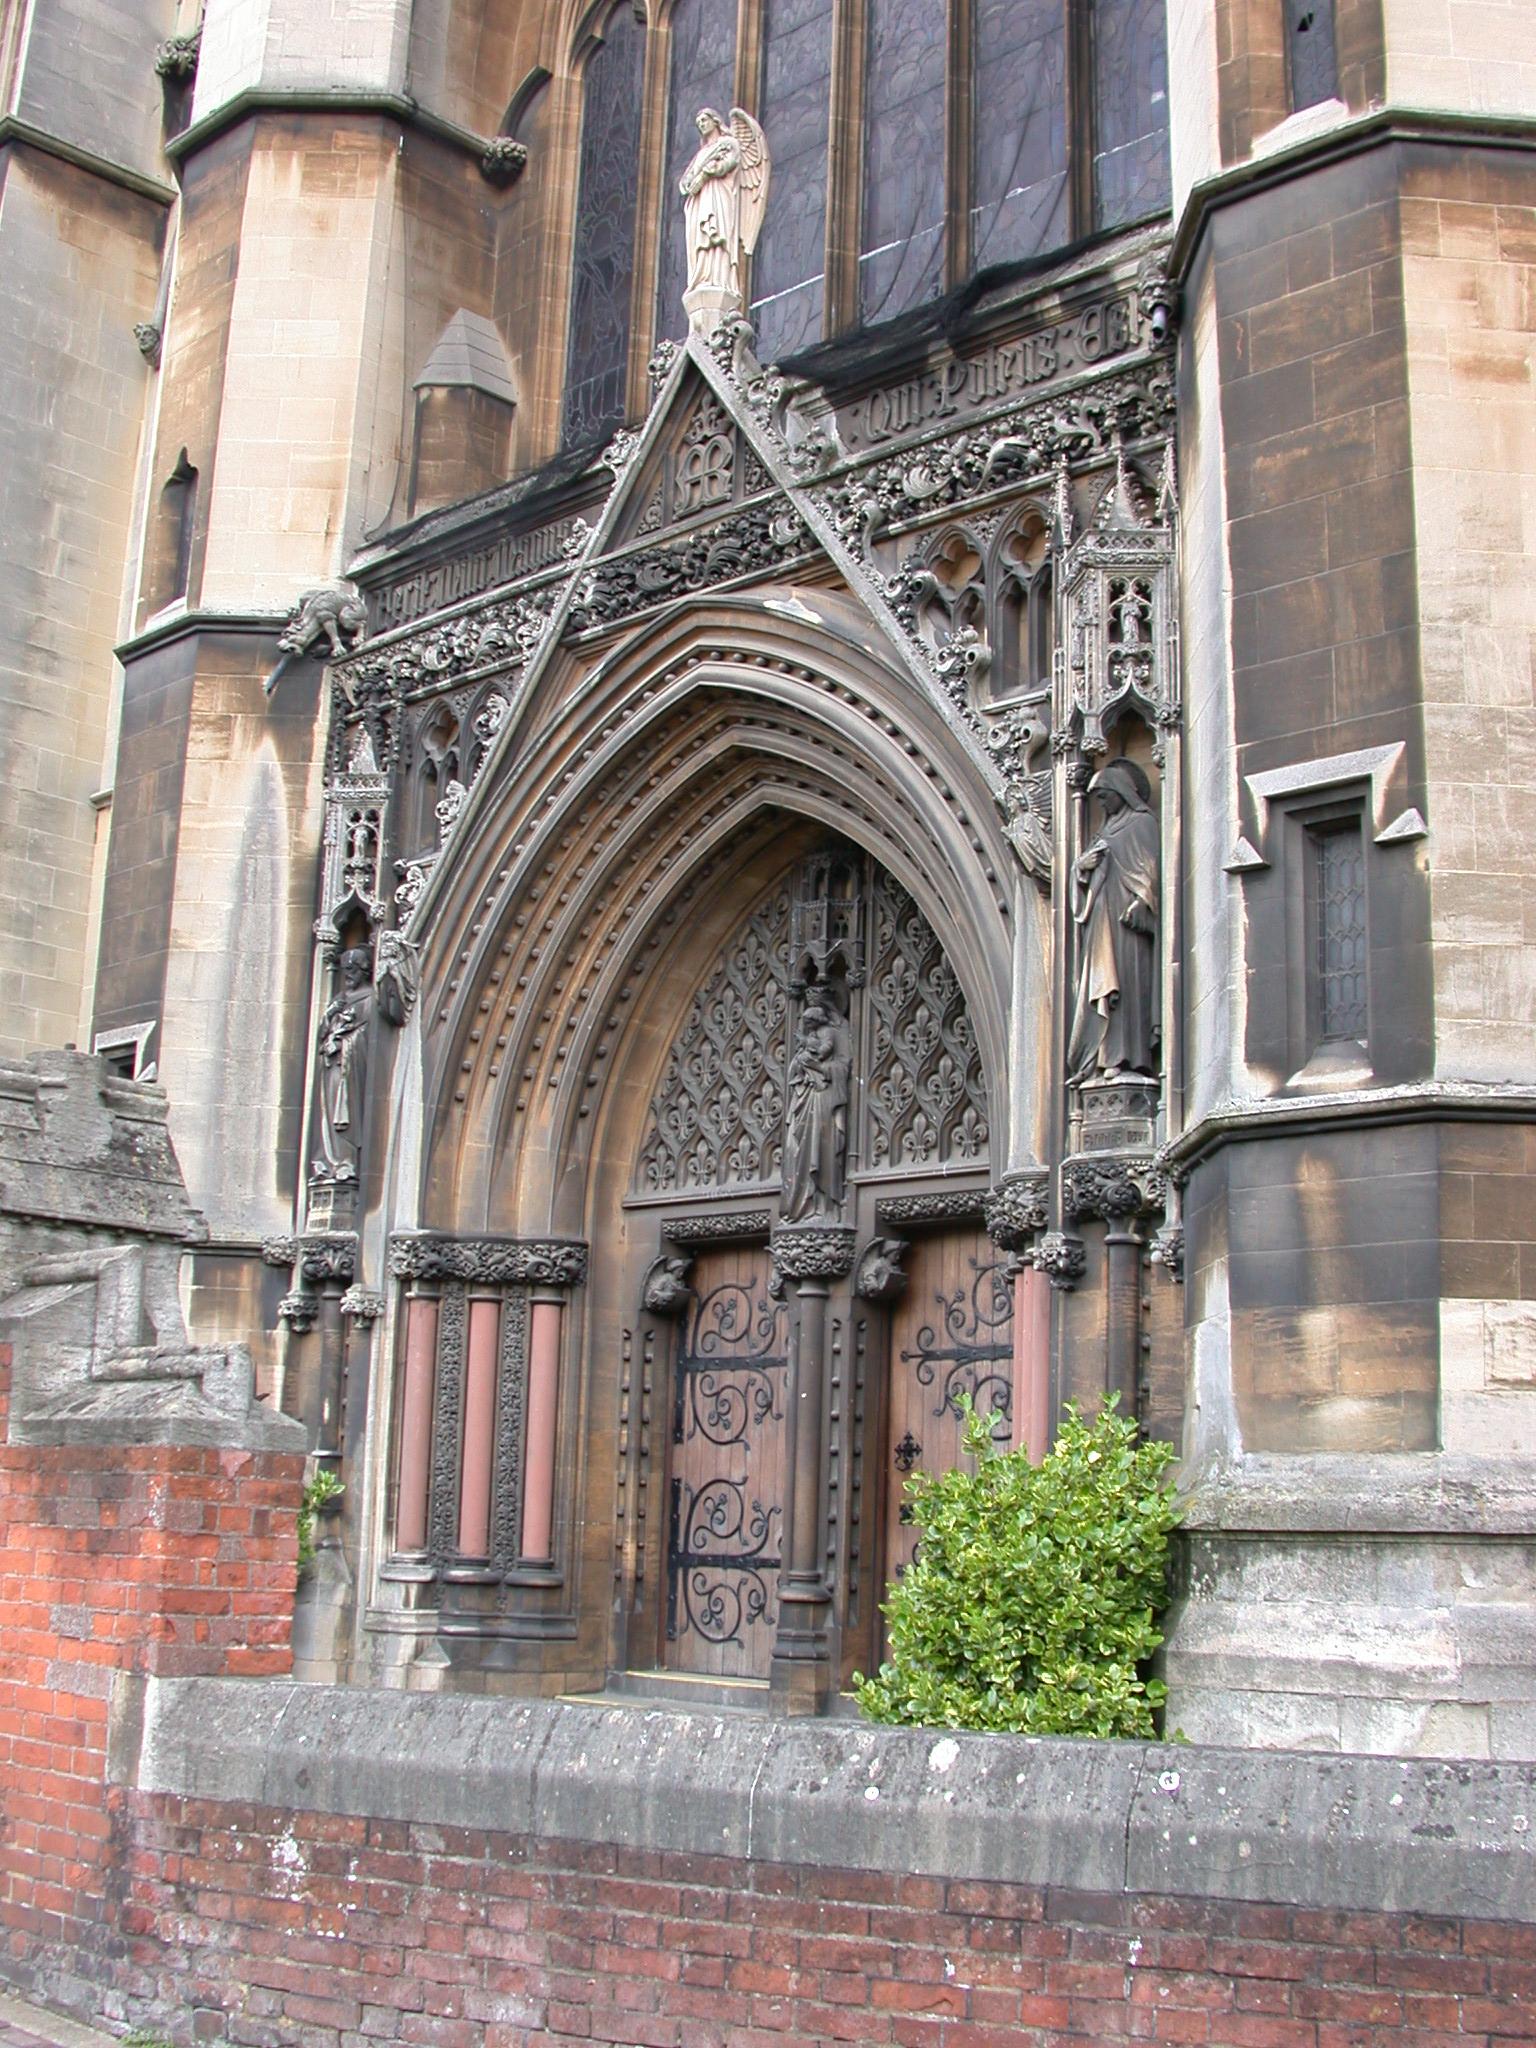 Cathedral, Cambridge, England